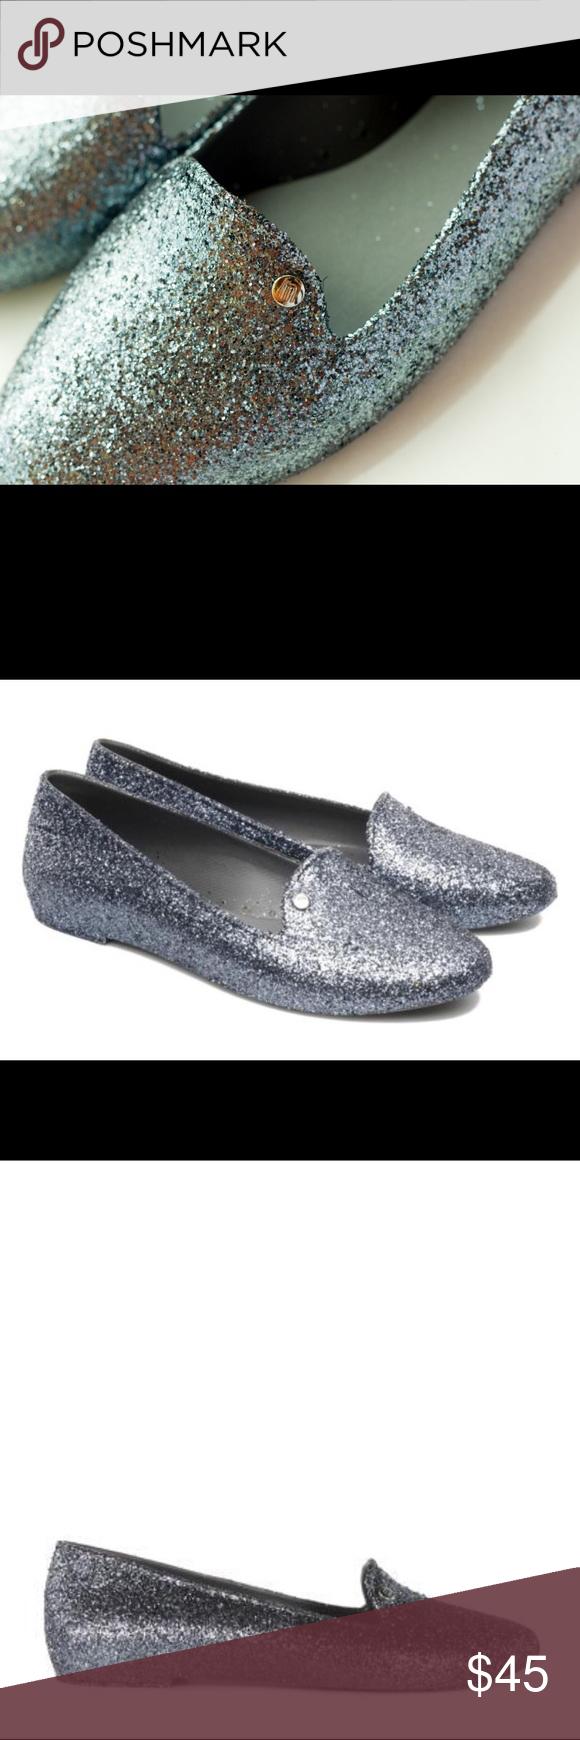 2caced5483c EUC Melissa Virtue Gunmetal Grey Glitter Flats EUC! No obvious signs of  wear! The